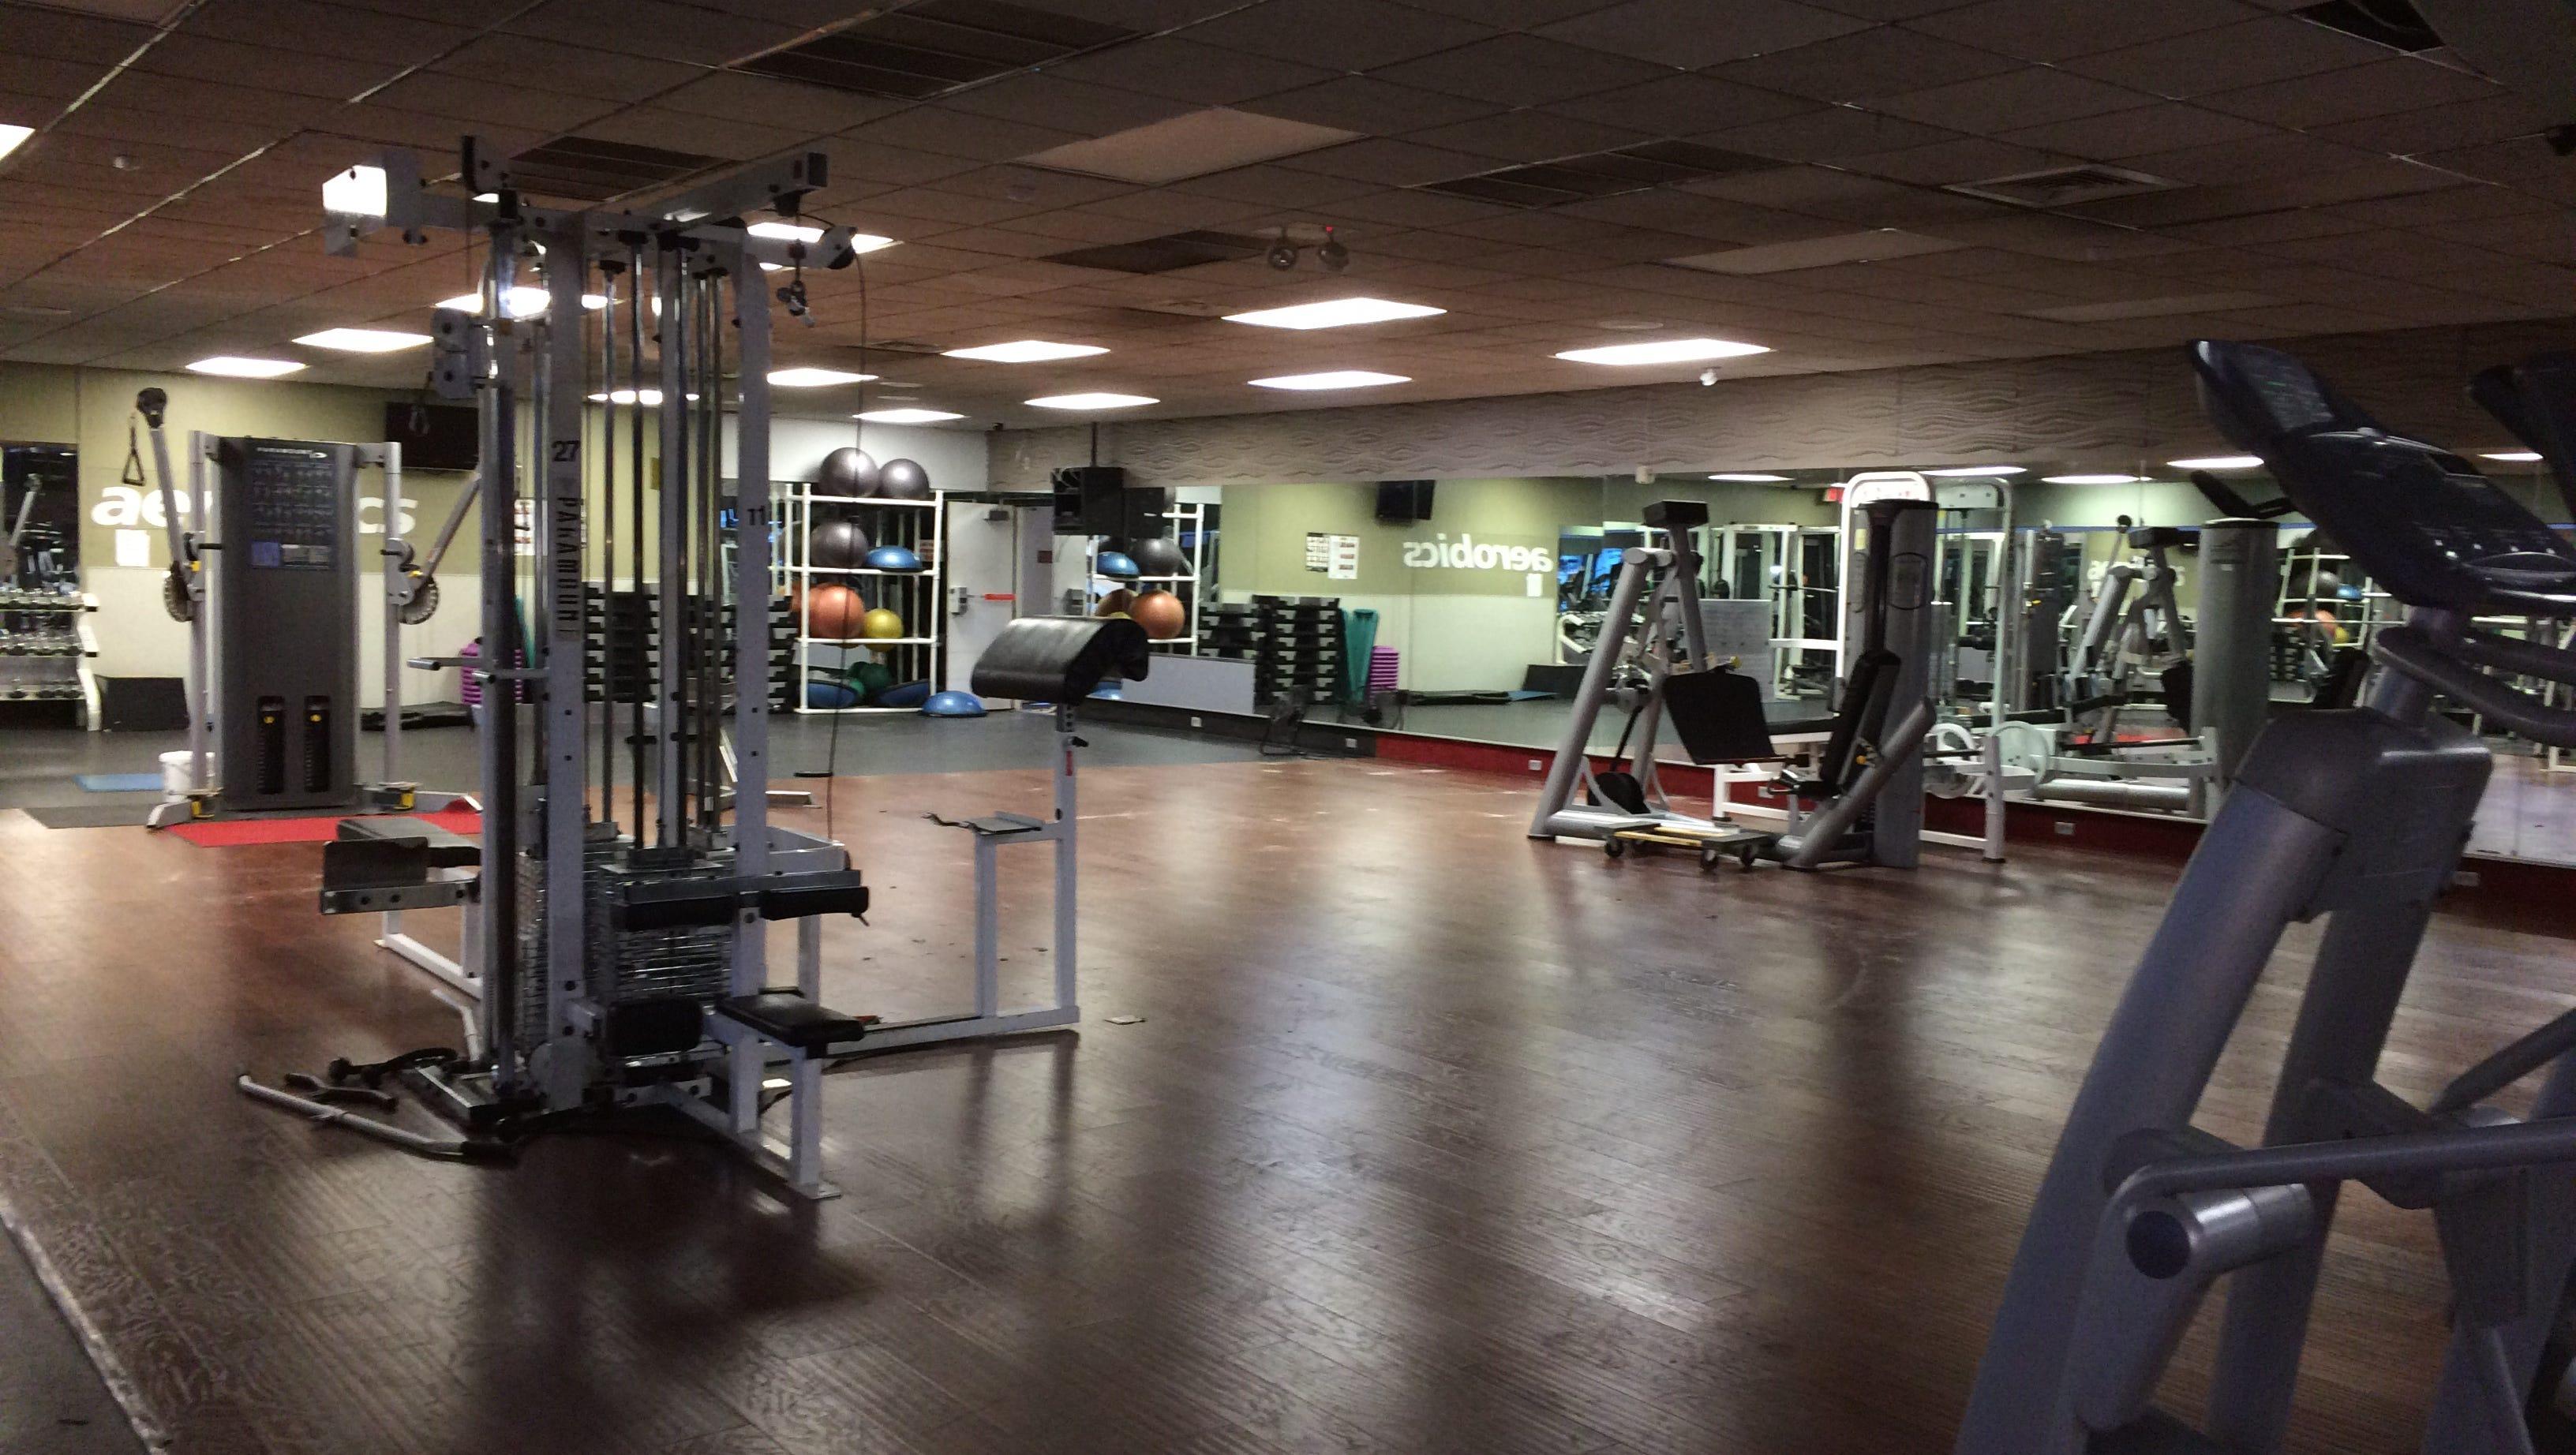 Putnam gym members file complaints over closing